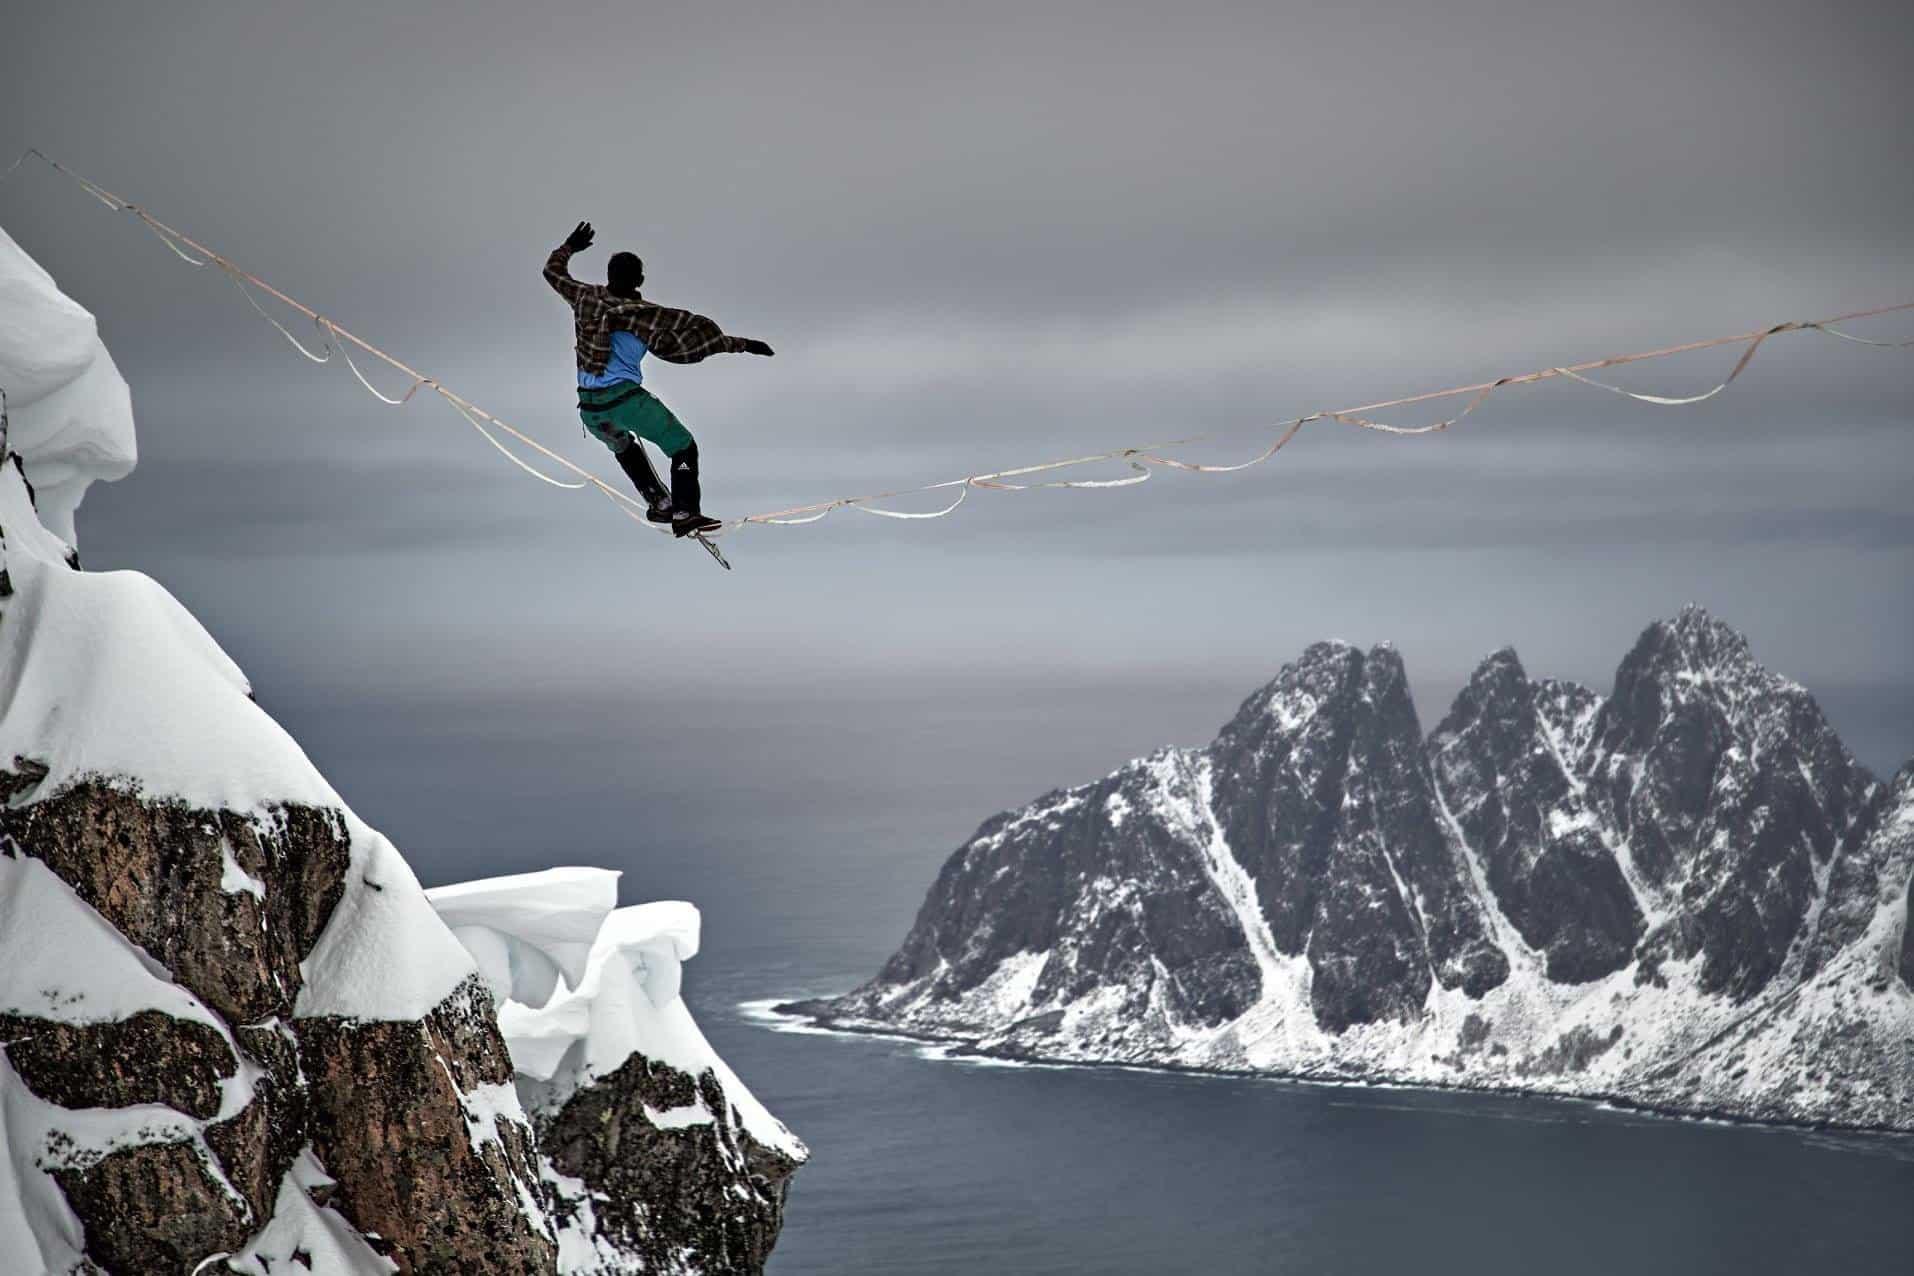 Banff Mountain Film Festival 2021 - Pathfinder: Life Beyond Fear